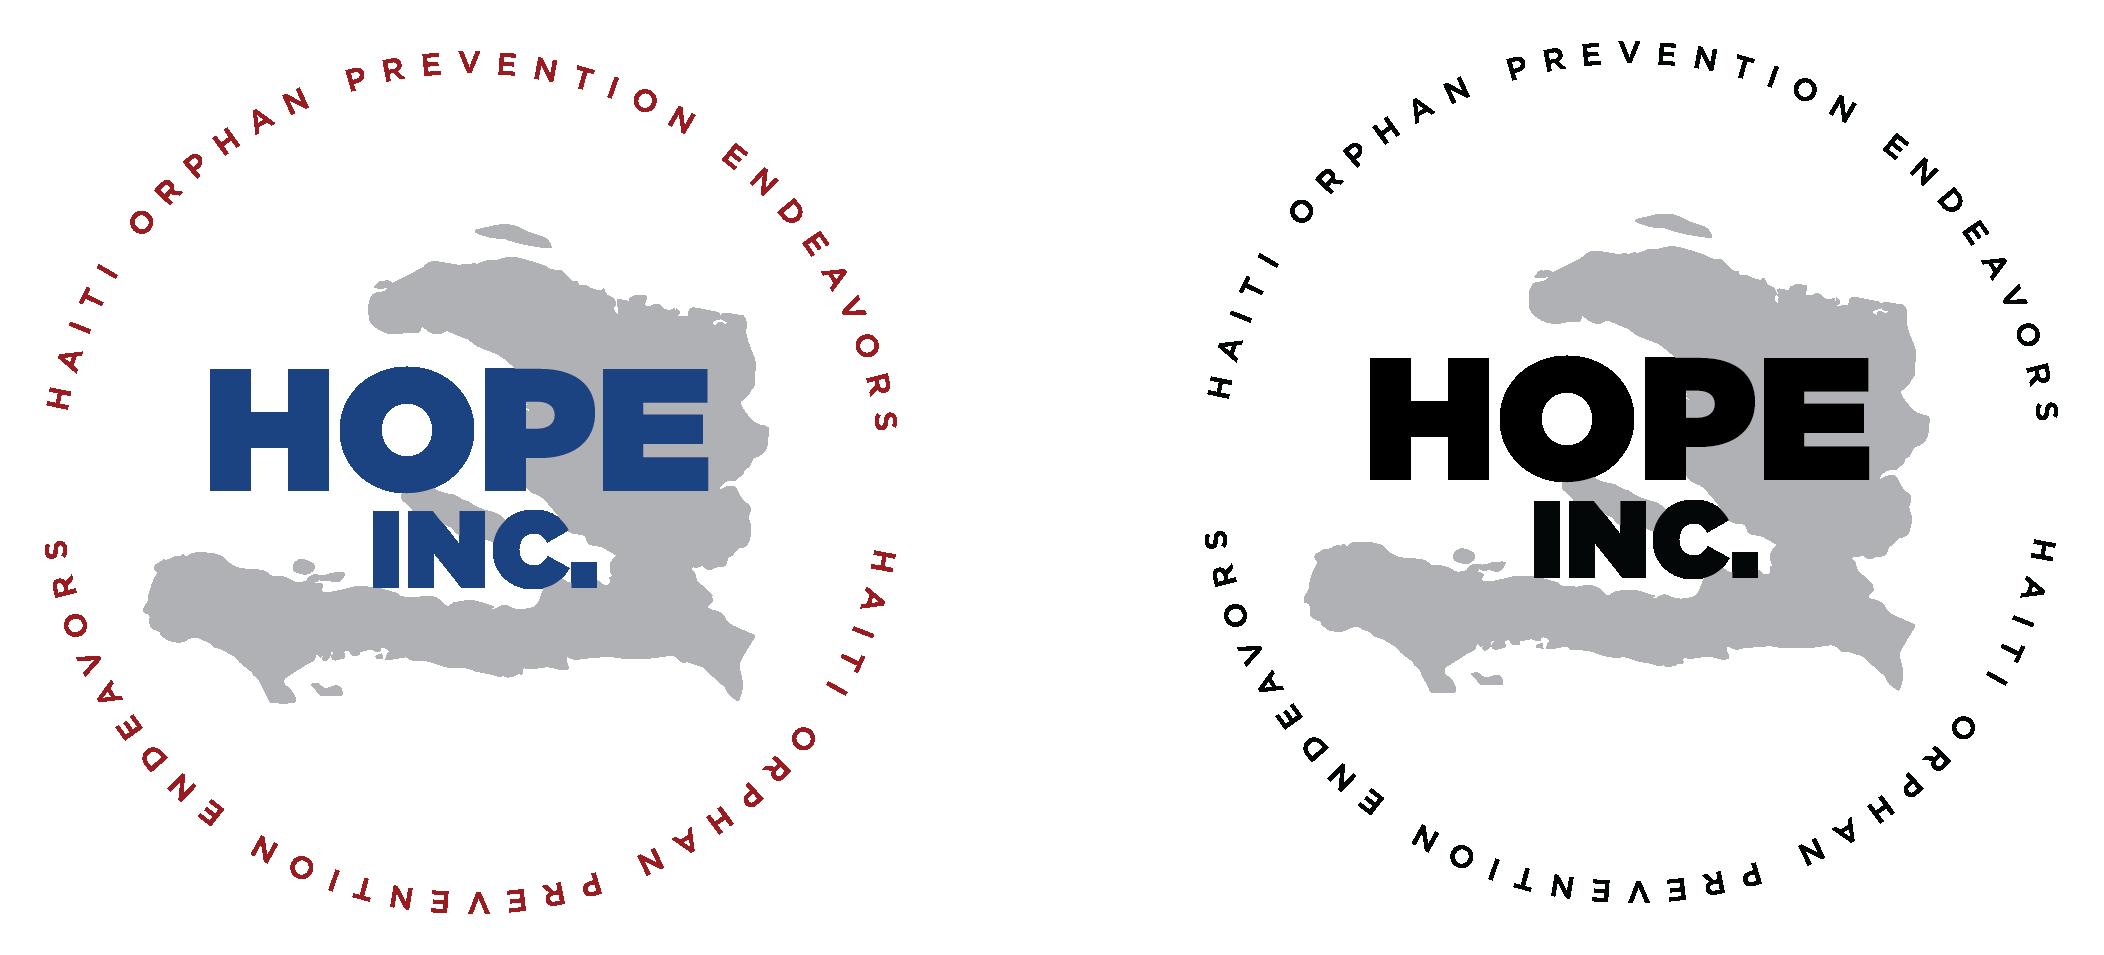 HOPECircle.png